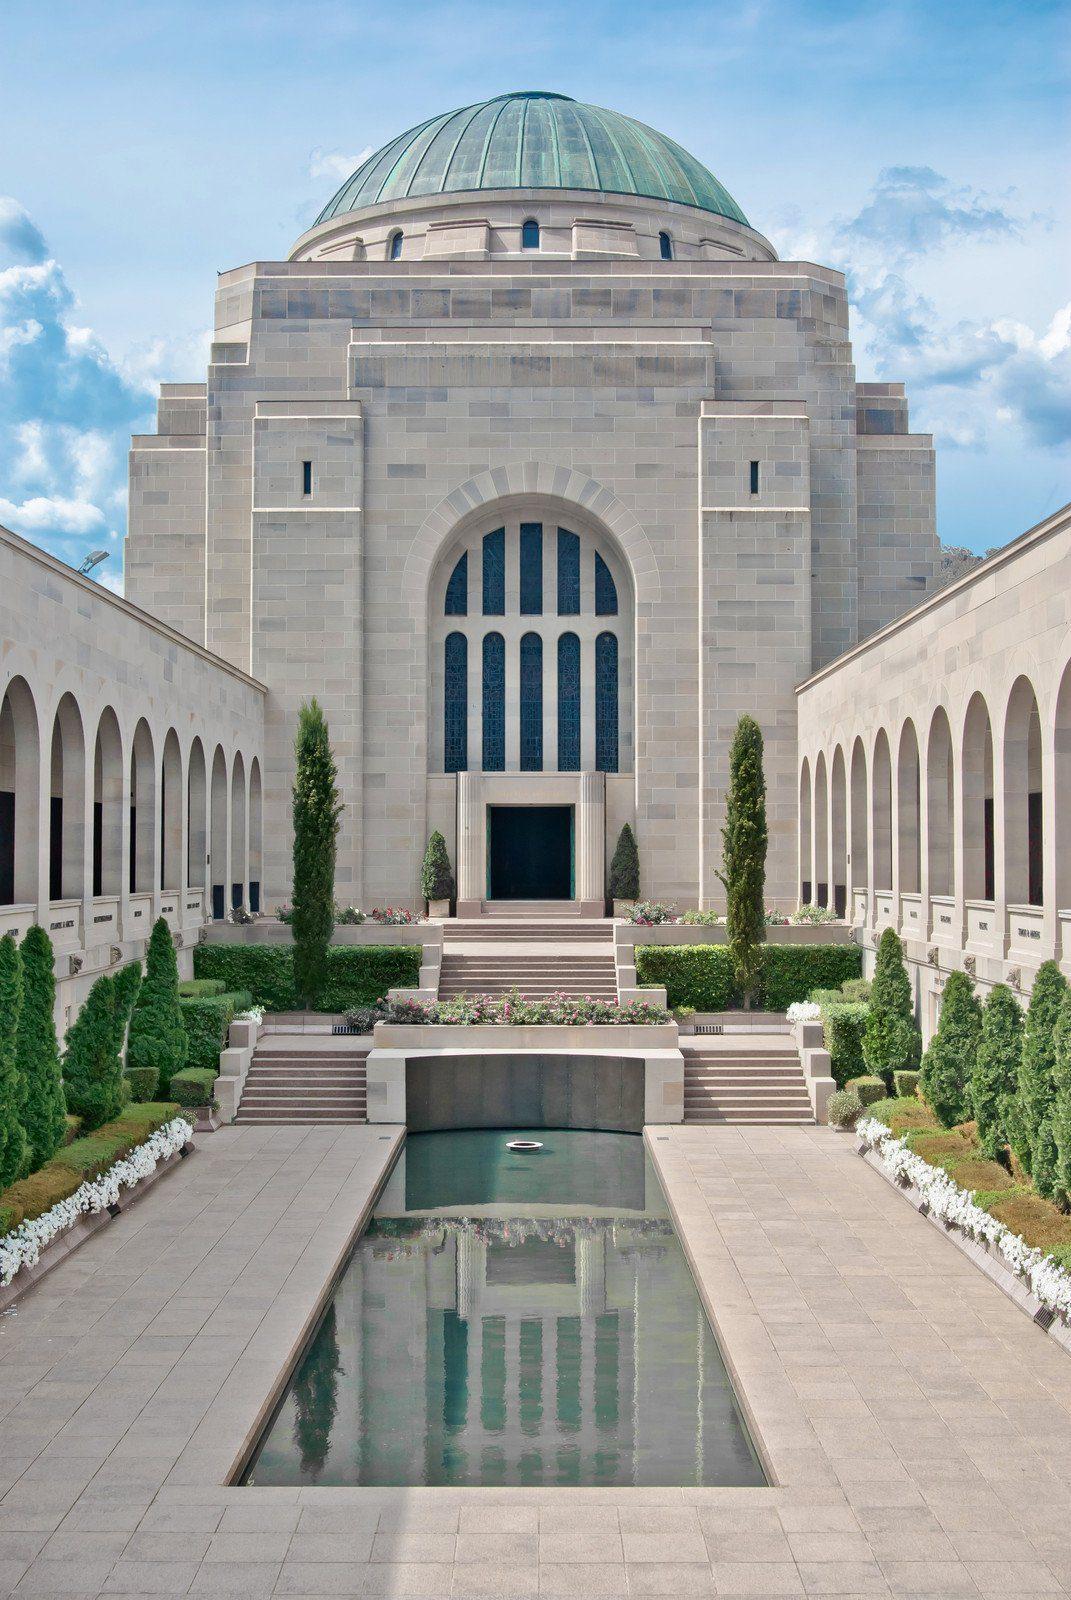 The Australian War Memorial in Canberra, Australia